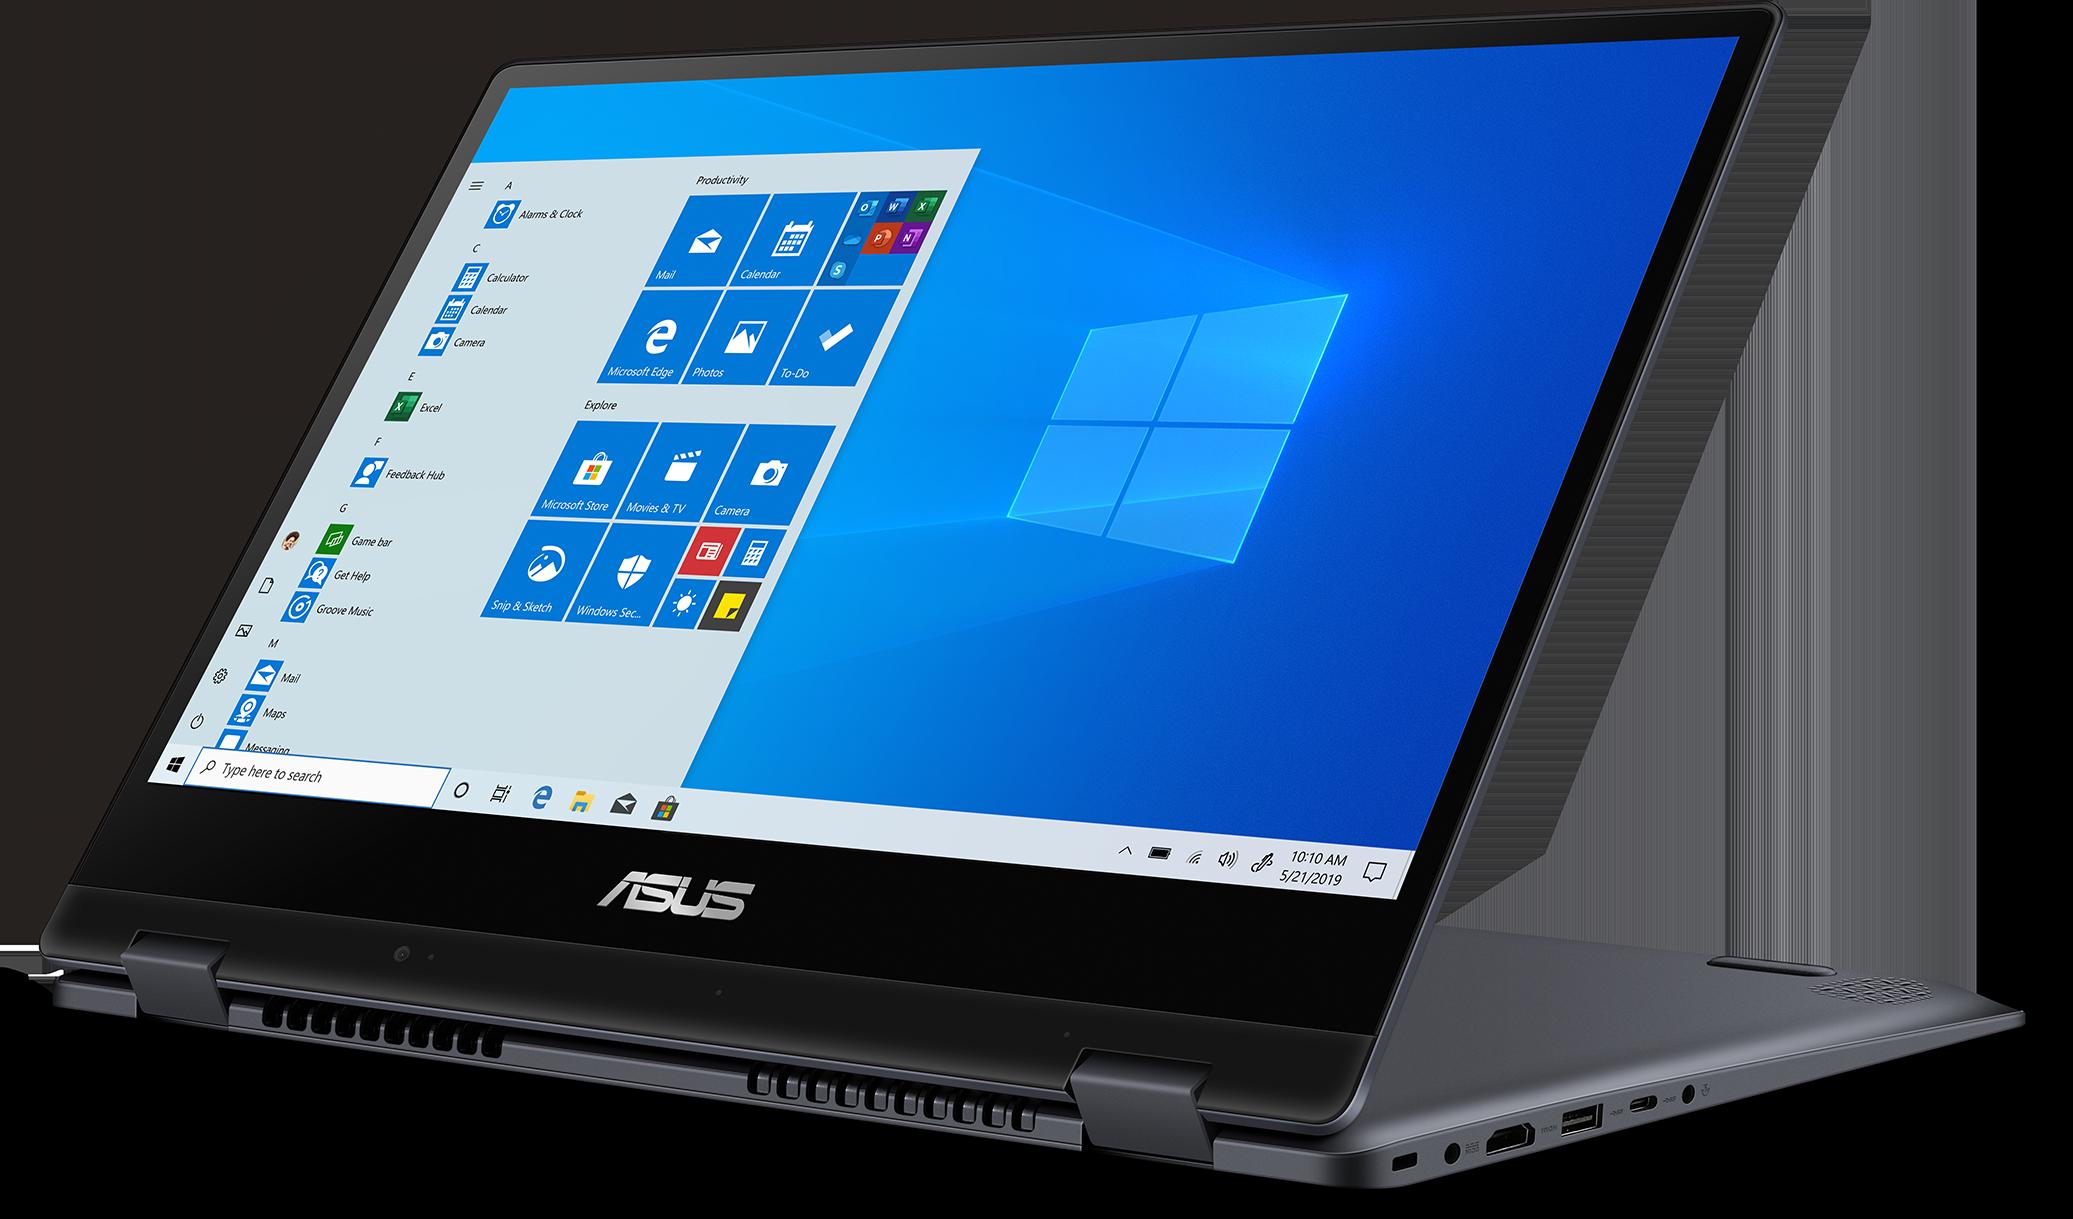 RE4qF8C?ver=a9ae - Asus VivoBook Flip TP412FA-XB55T 2-in-1 PC